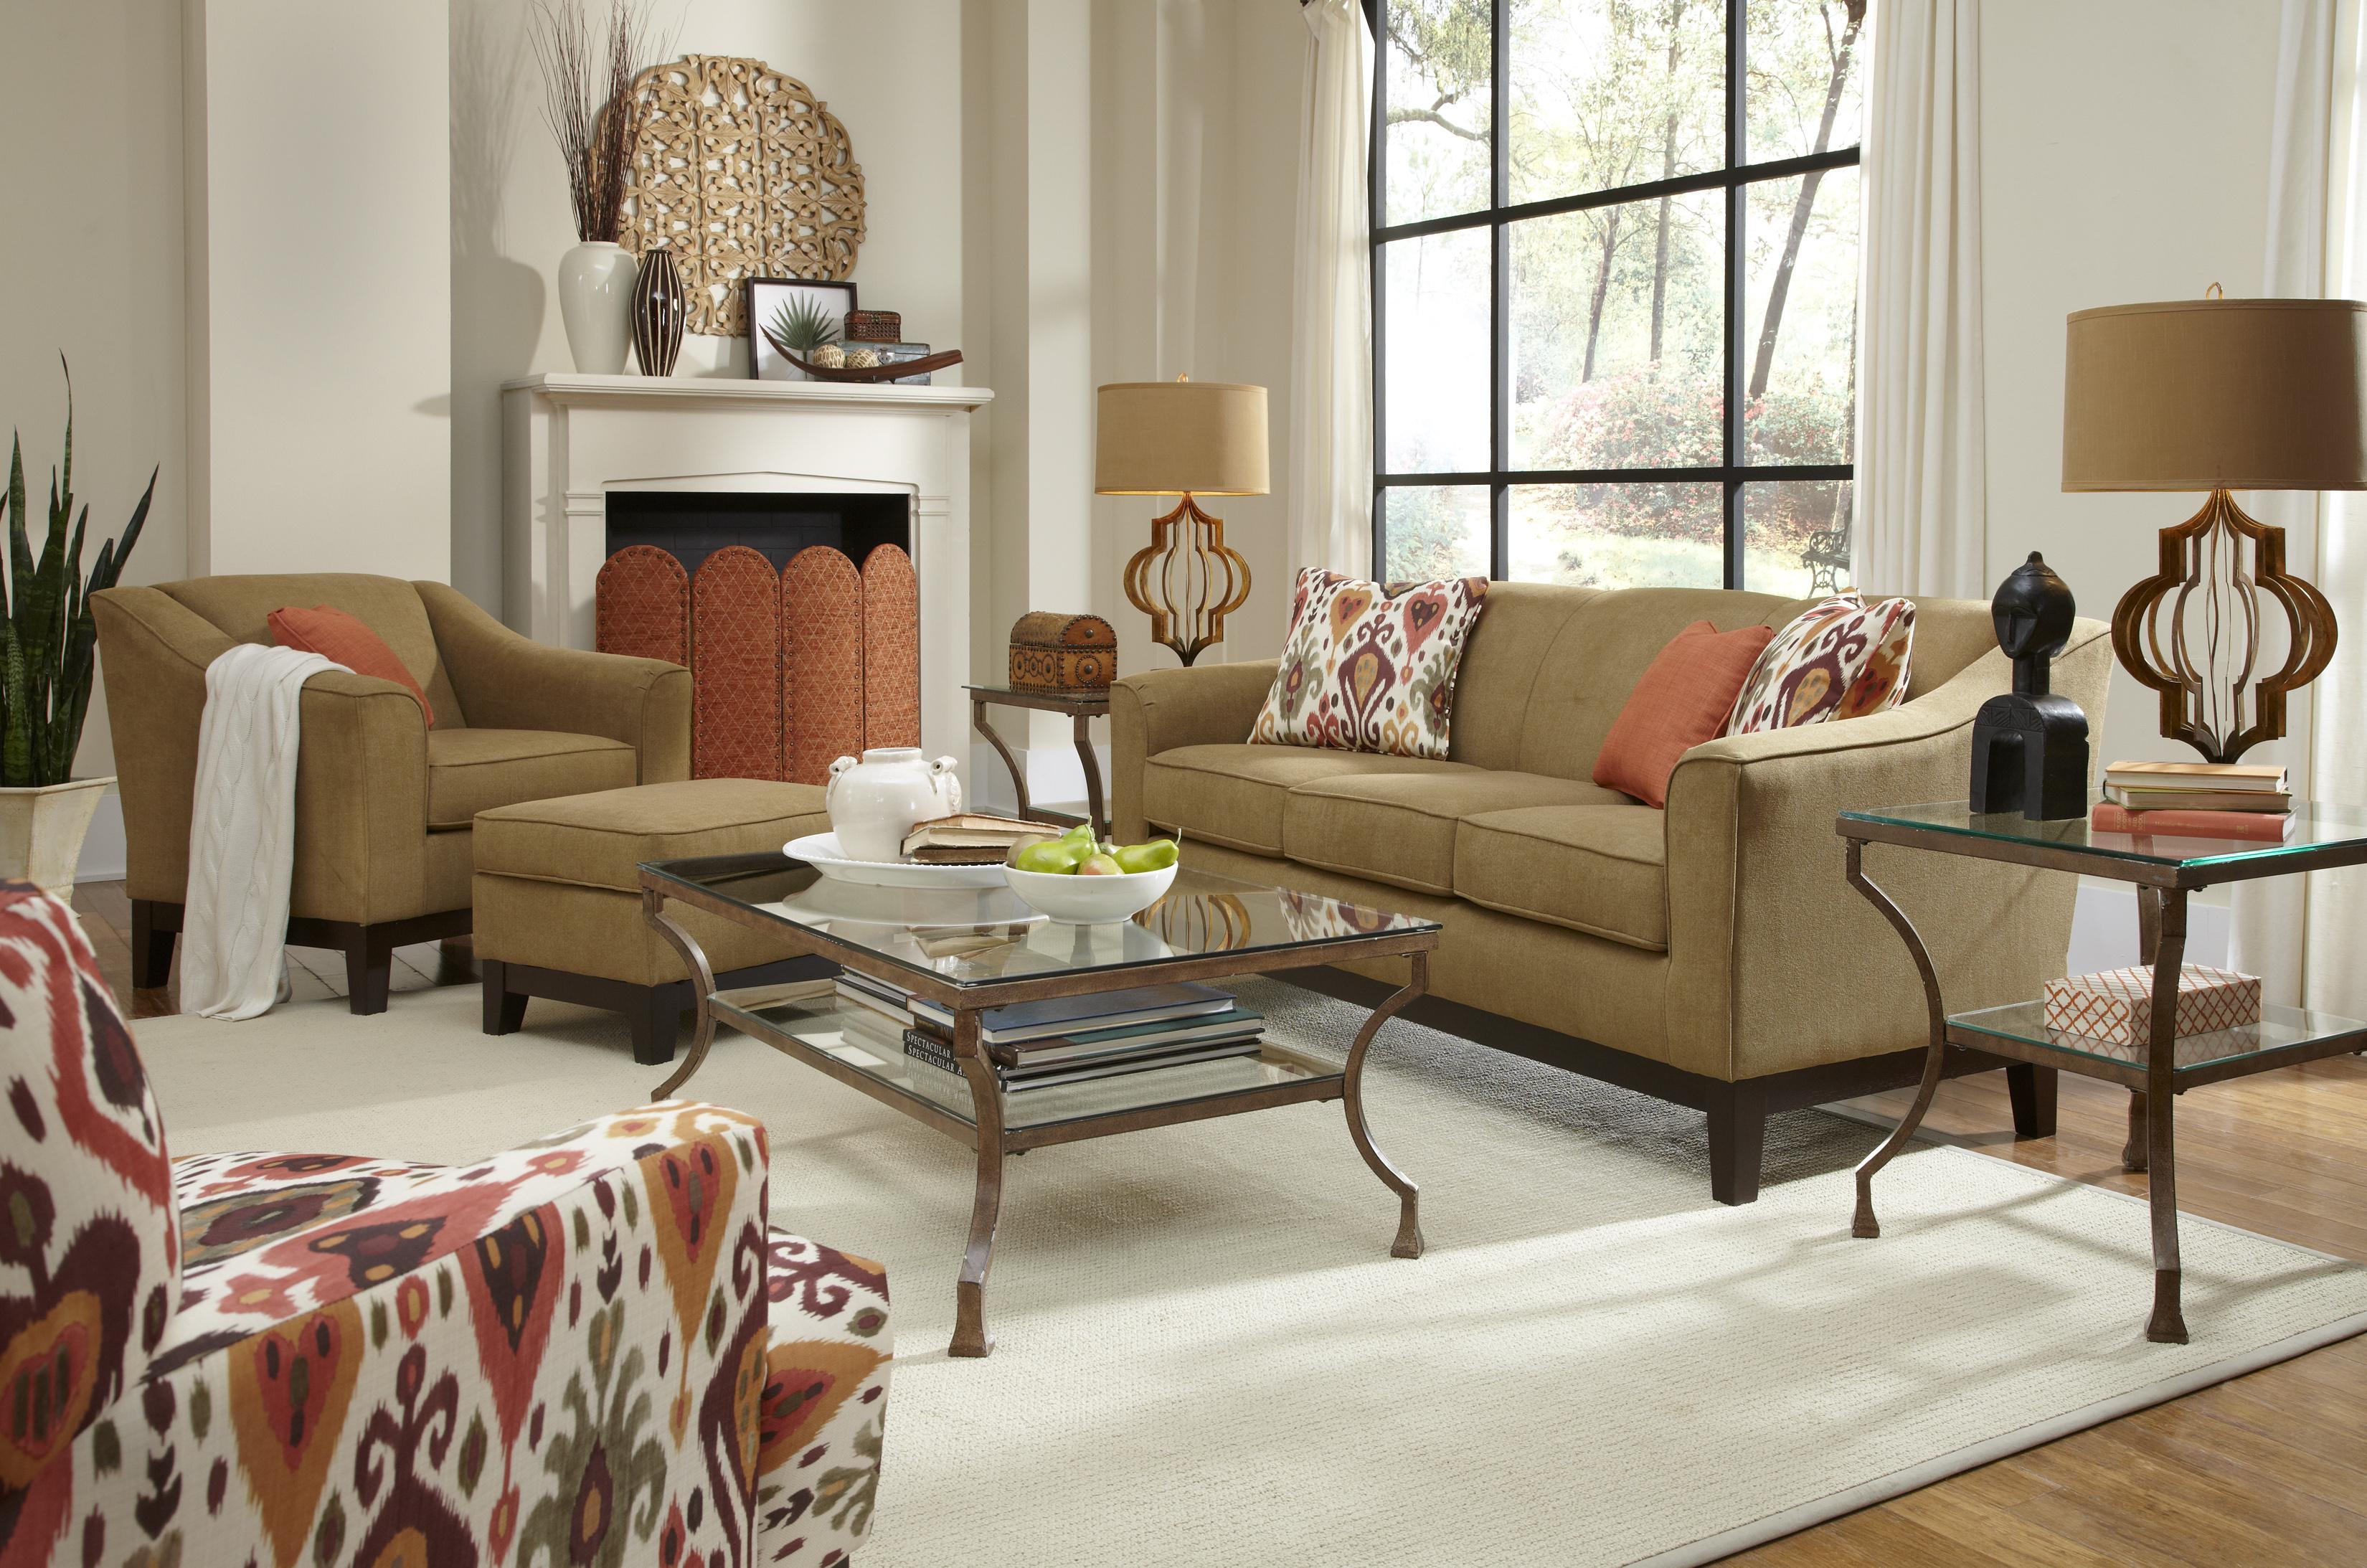 Best Home Furnishings Emeline Stationary Living Room Group  Hudsons Furniture  Upholstery Group